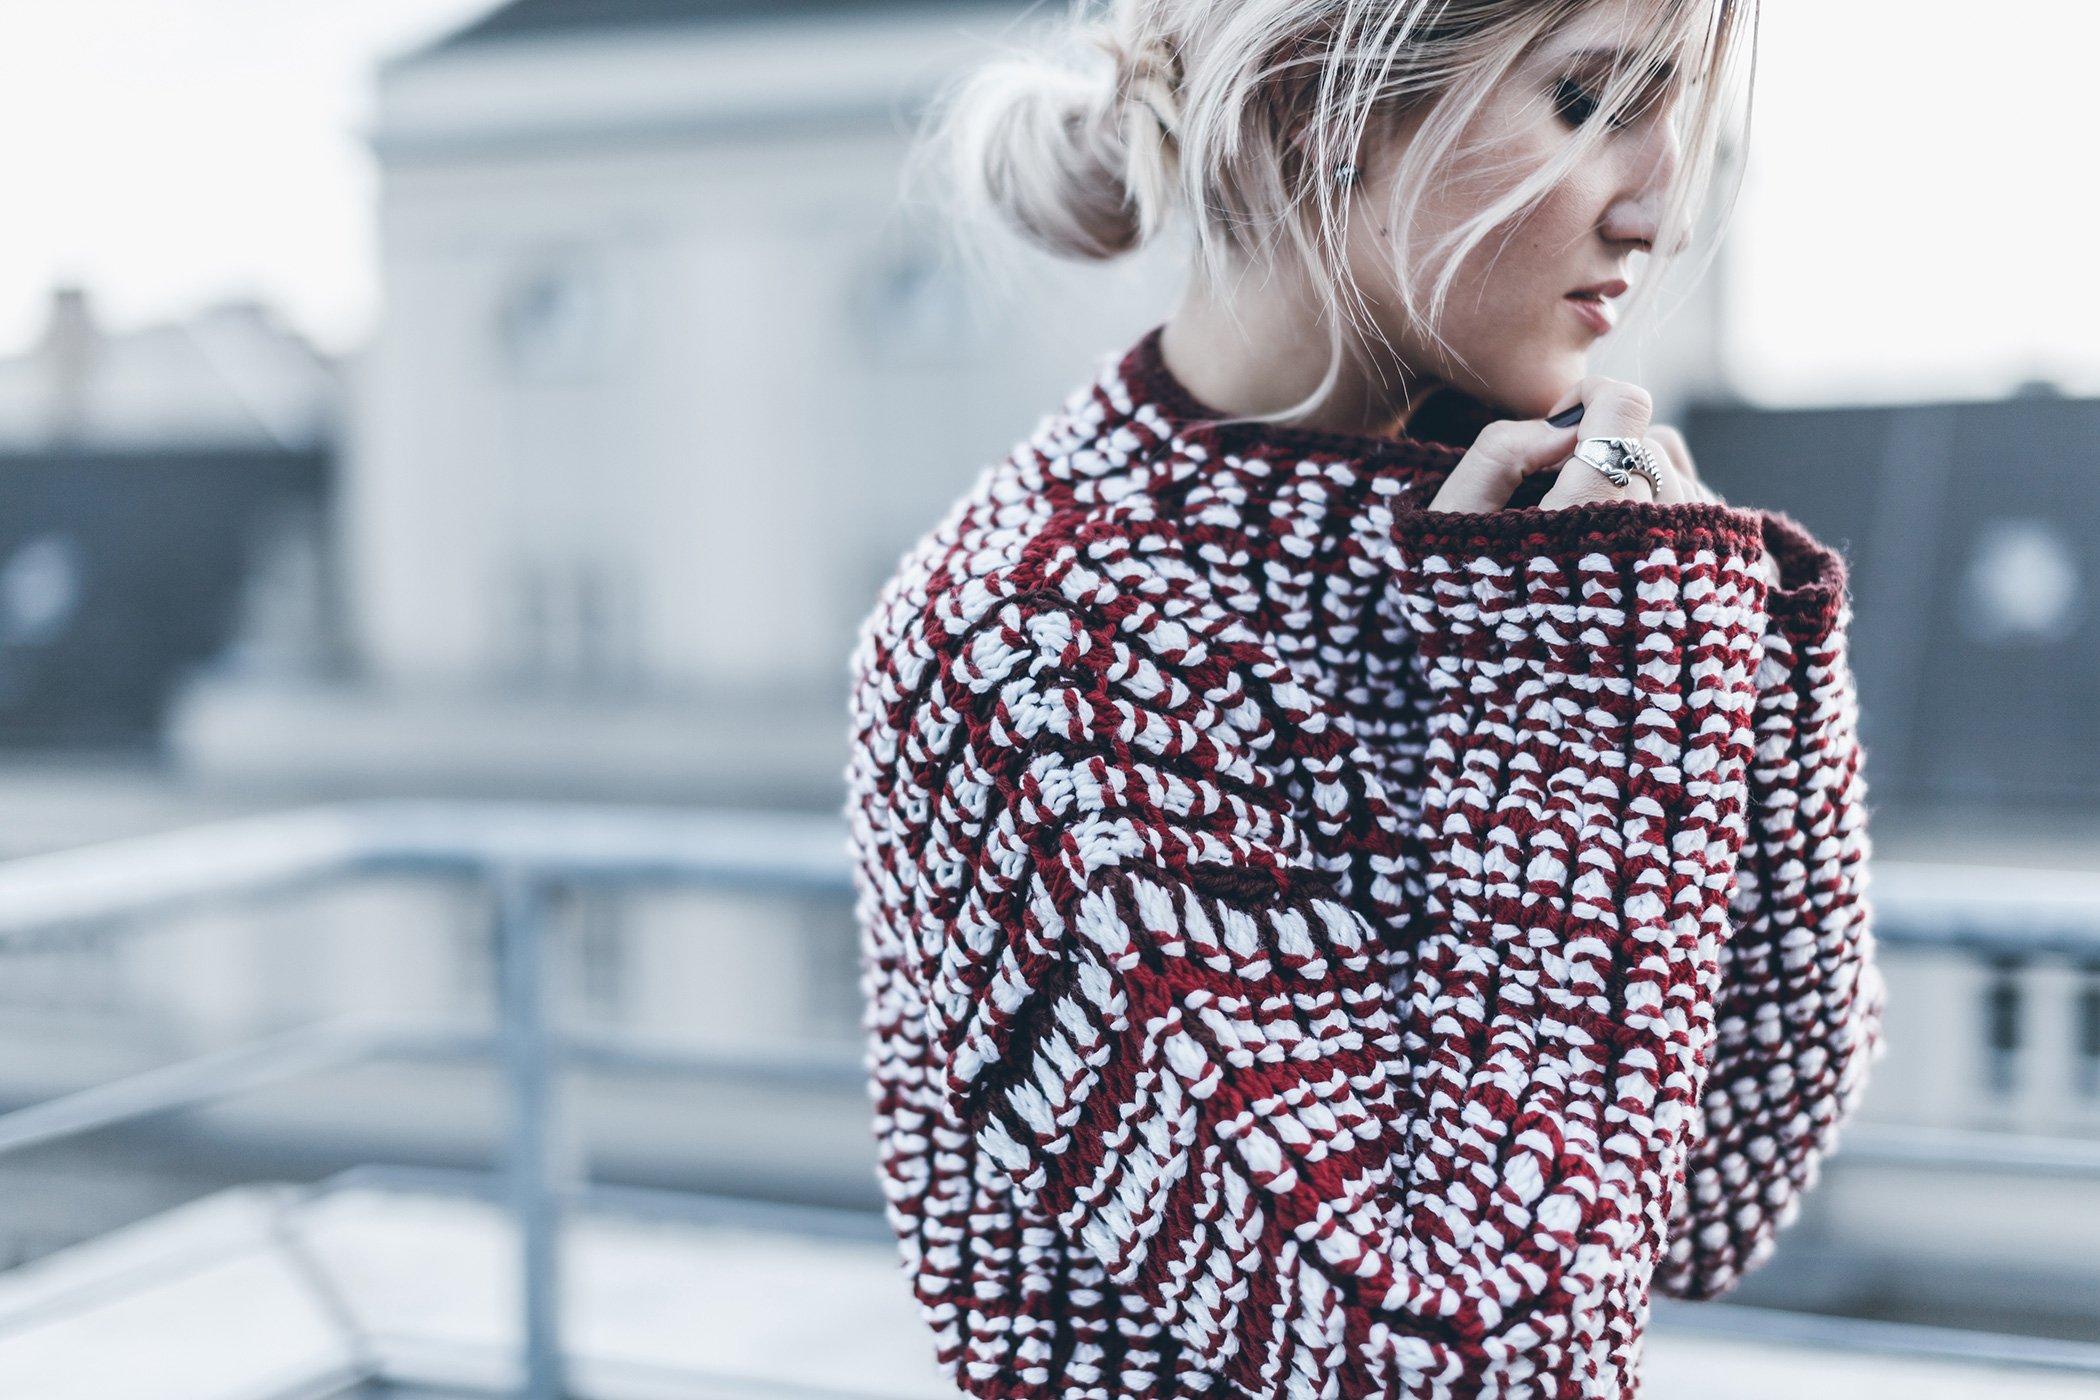 mikuta-and-vivian-graf-red-knit-22